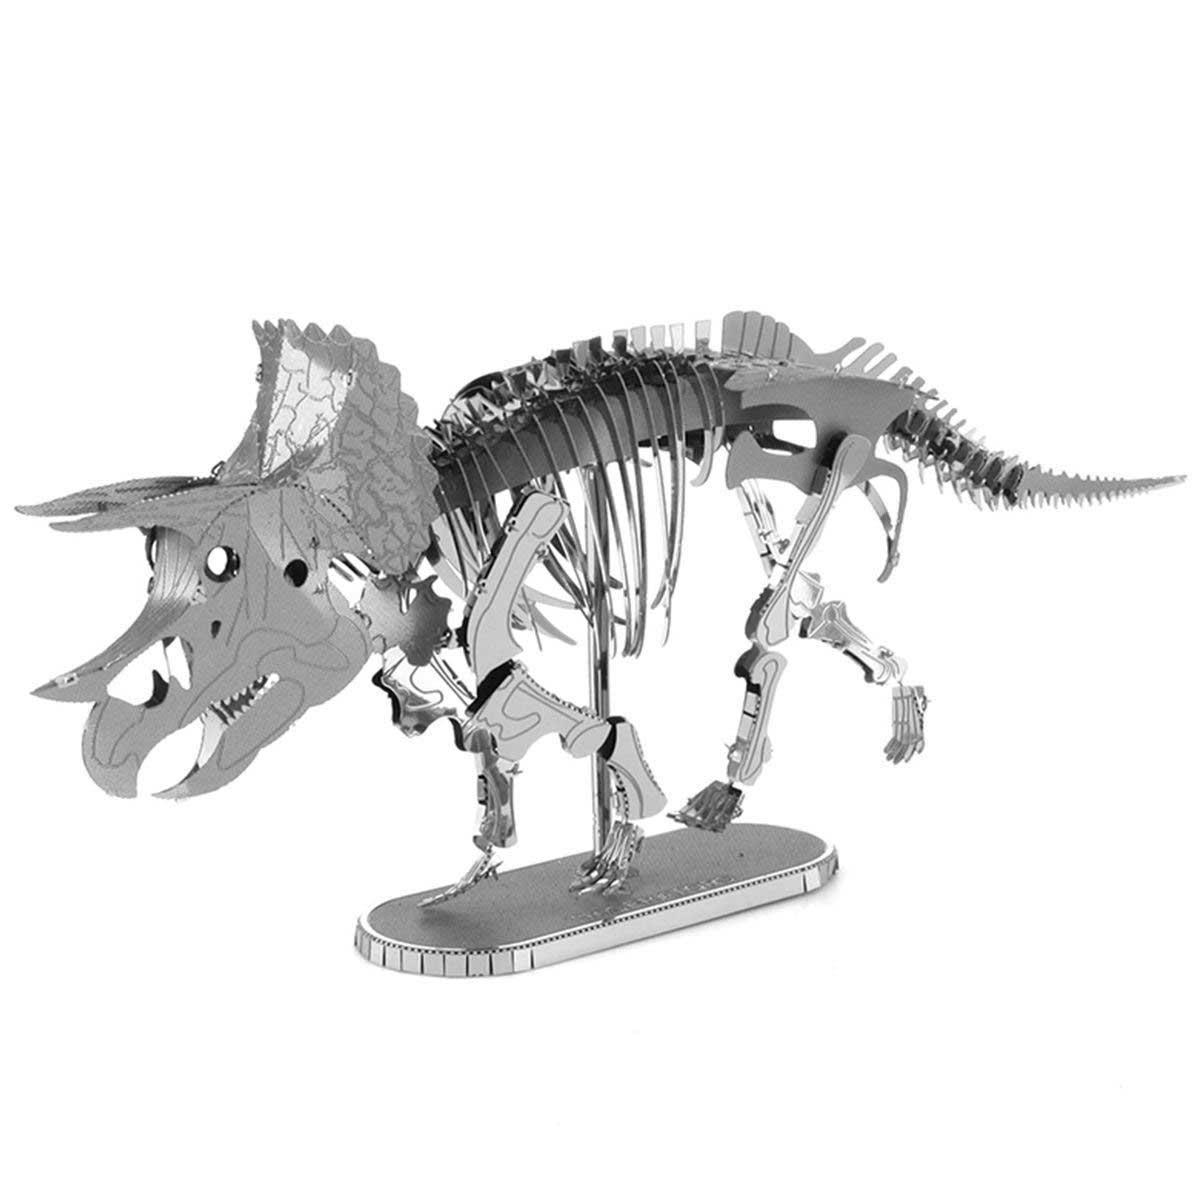 Triceratops Skeleton Dinosaurs Metal Puzzles